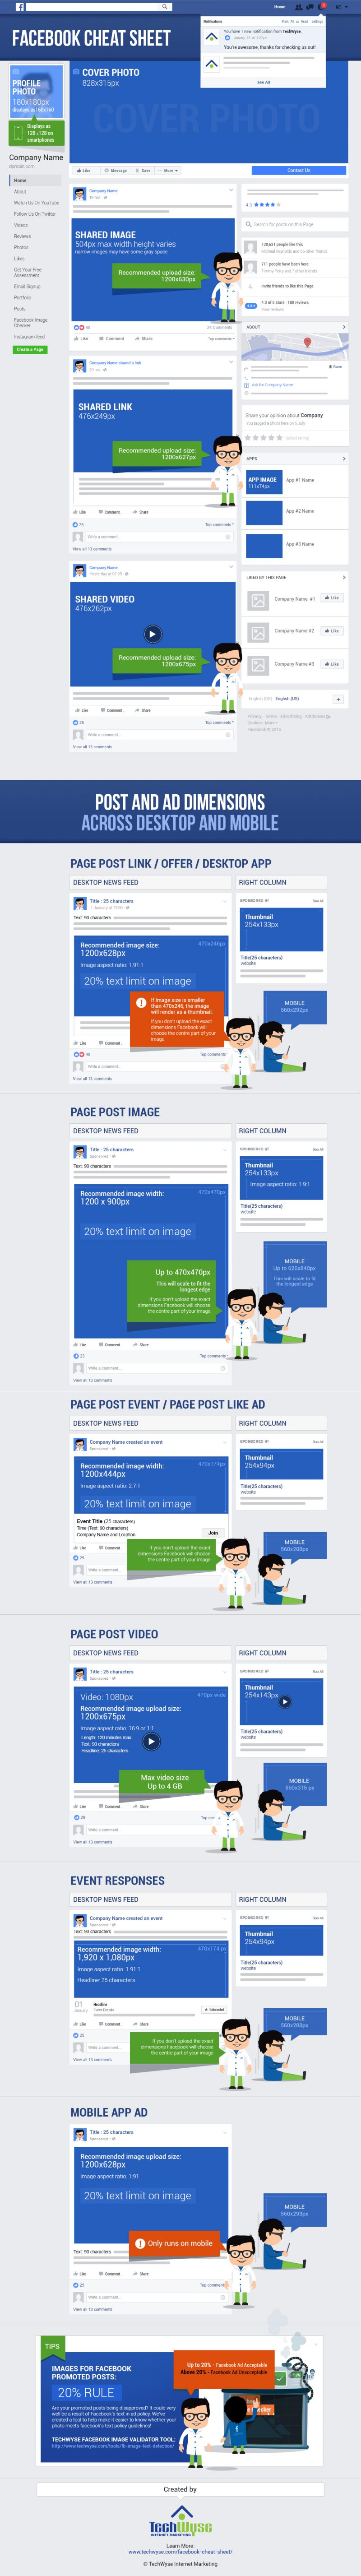 facebook-dimensions-photos-infographie